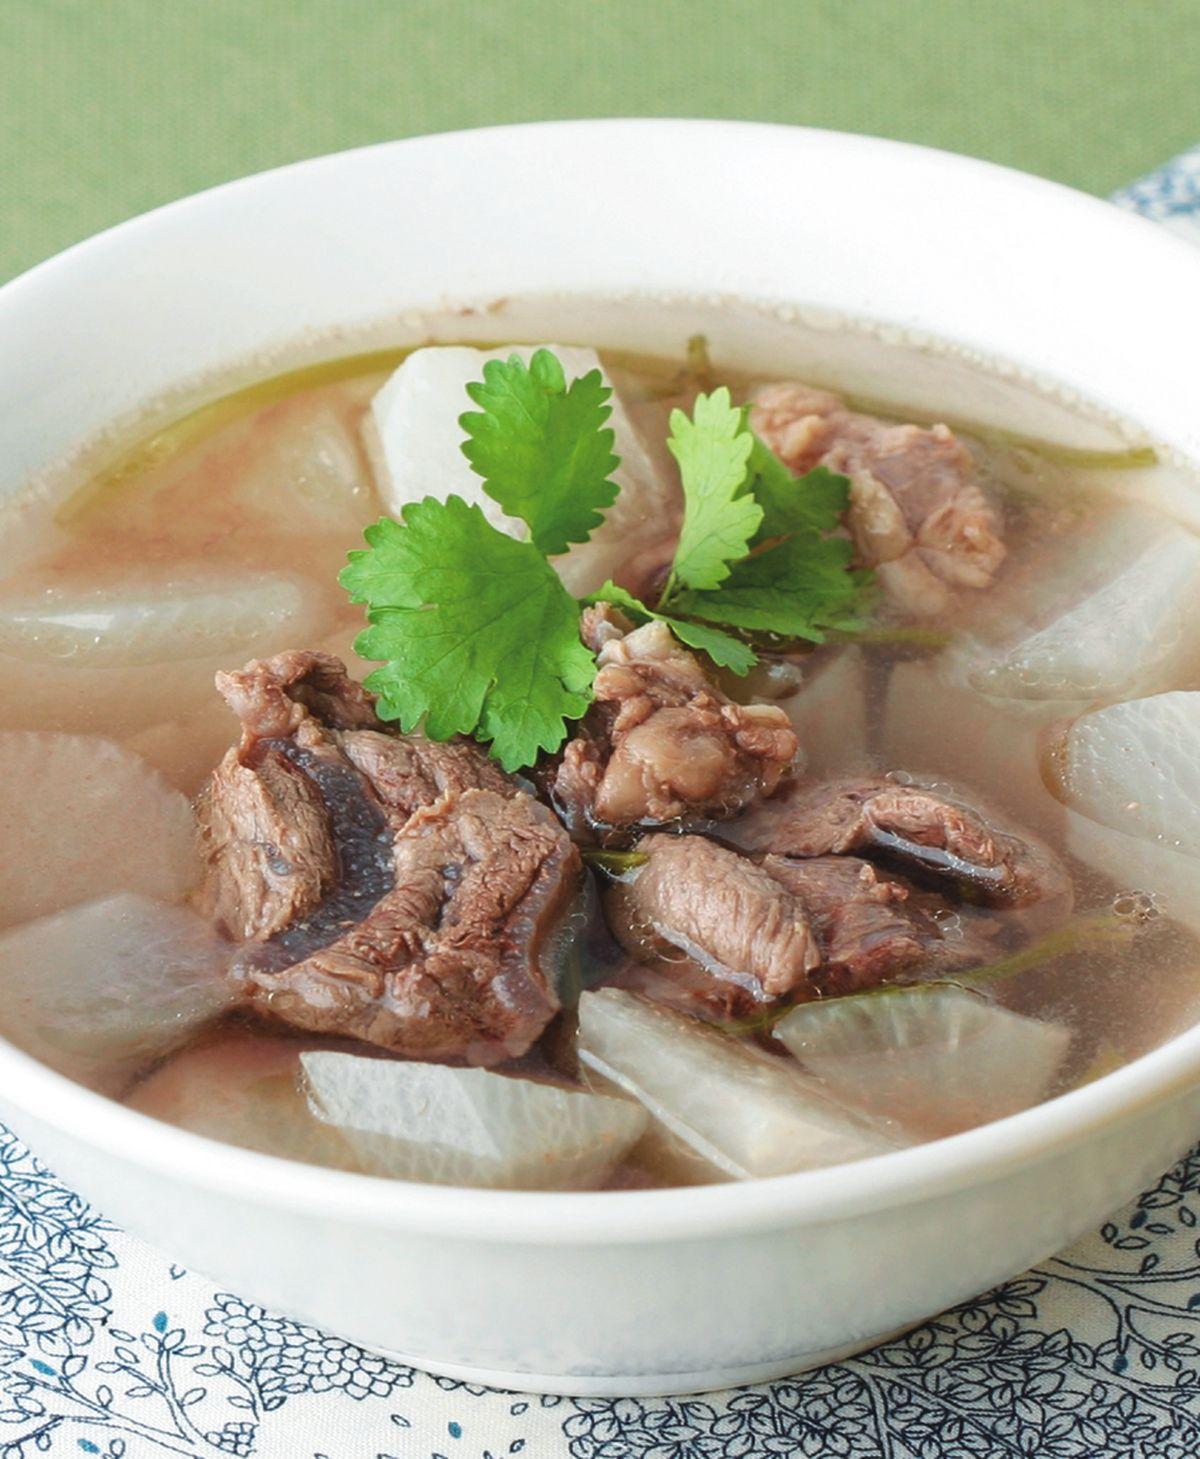 【食譜】清燉牛肉湯(1):www.ytower.com.tw